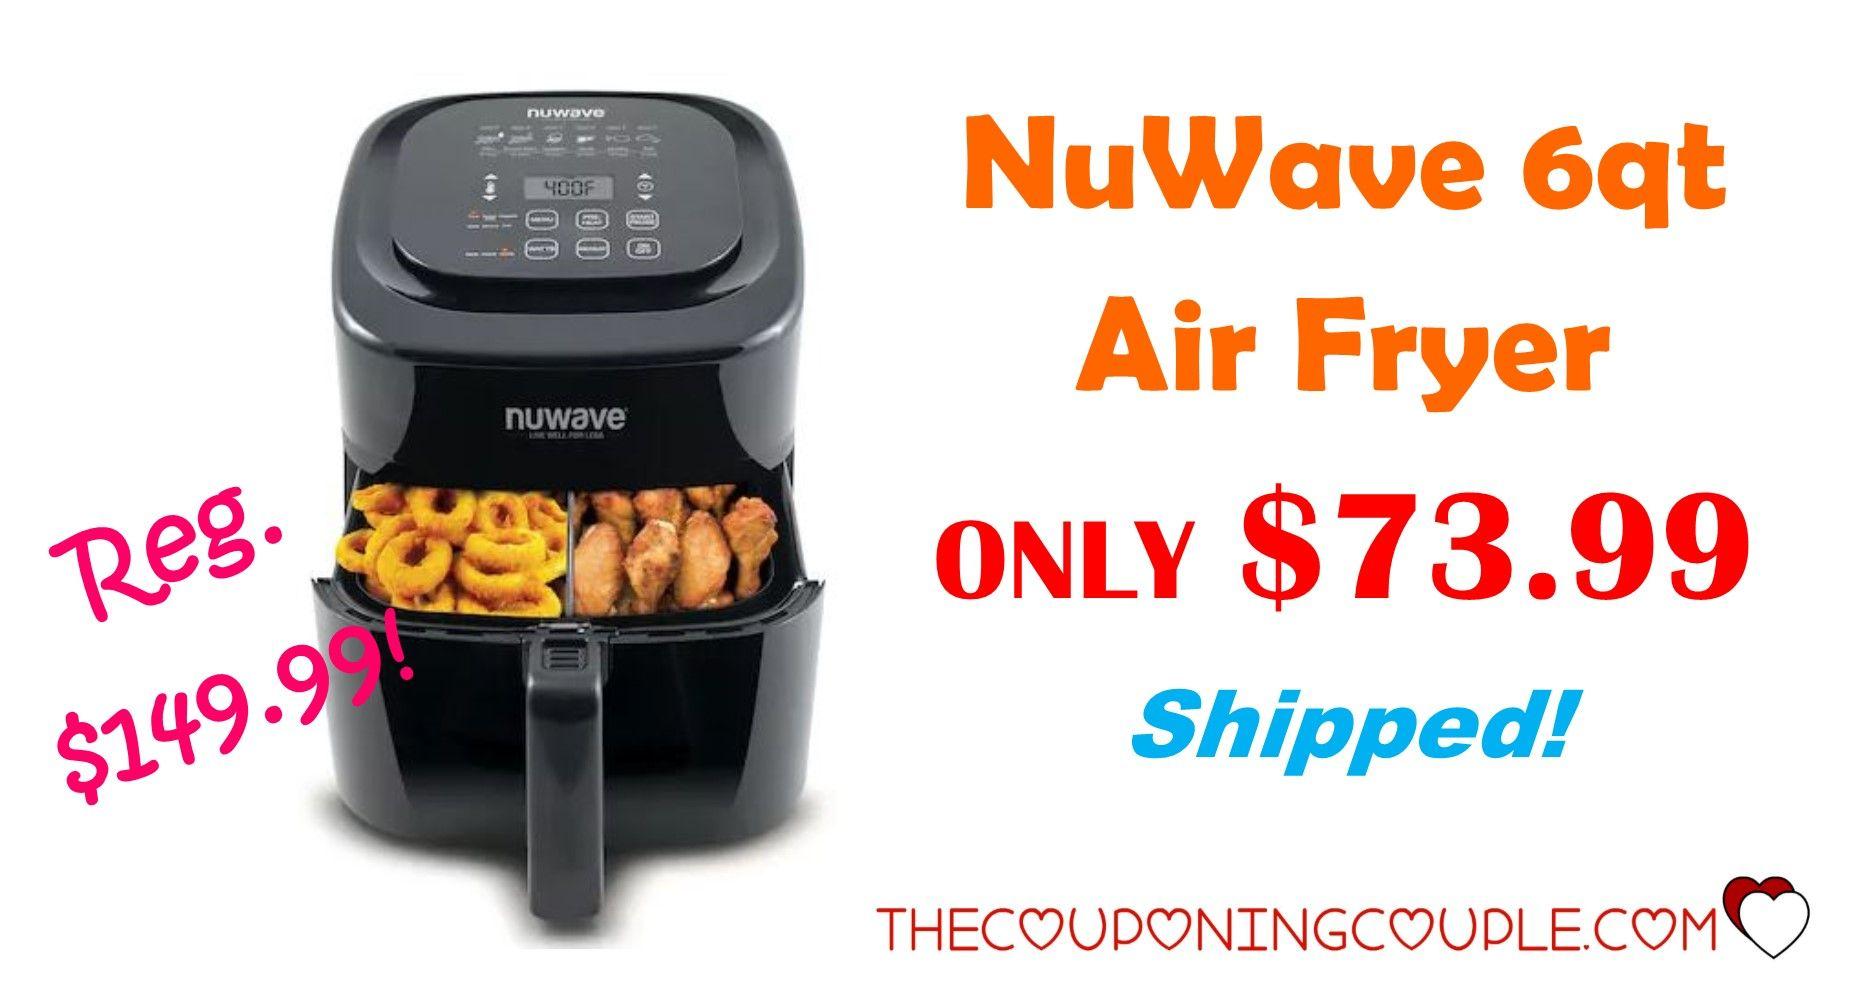 NuWave 6qt Air Fryer *GREAT DEAL* ONLY 40.99 (reg. 140